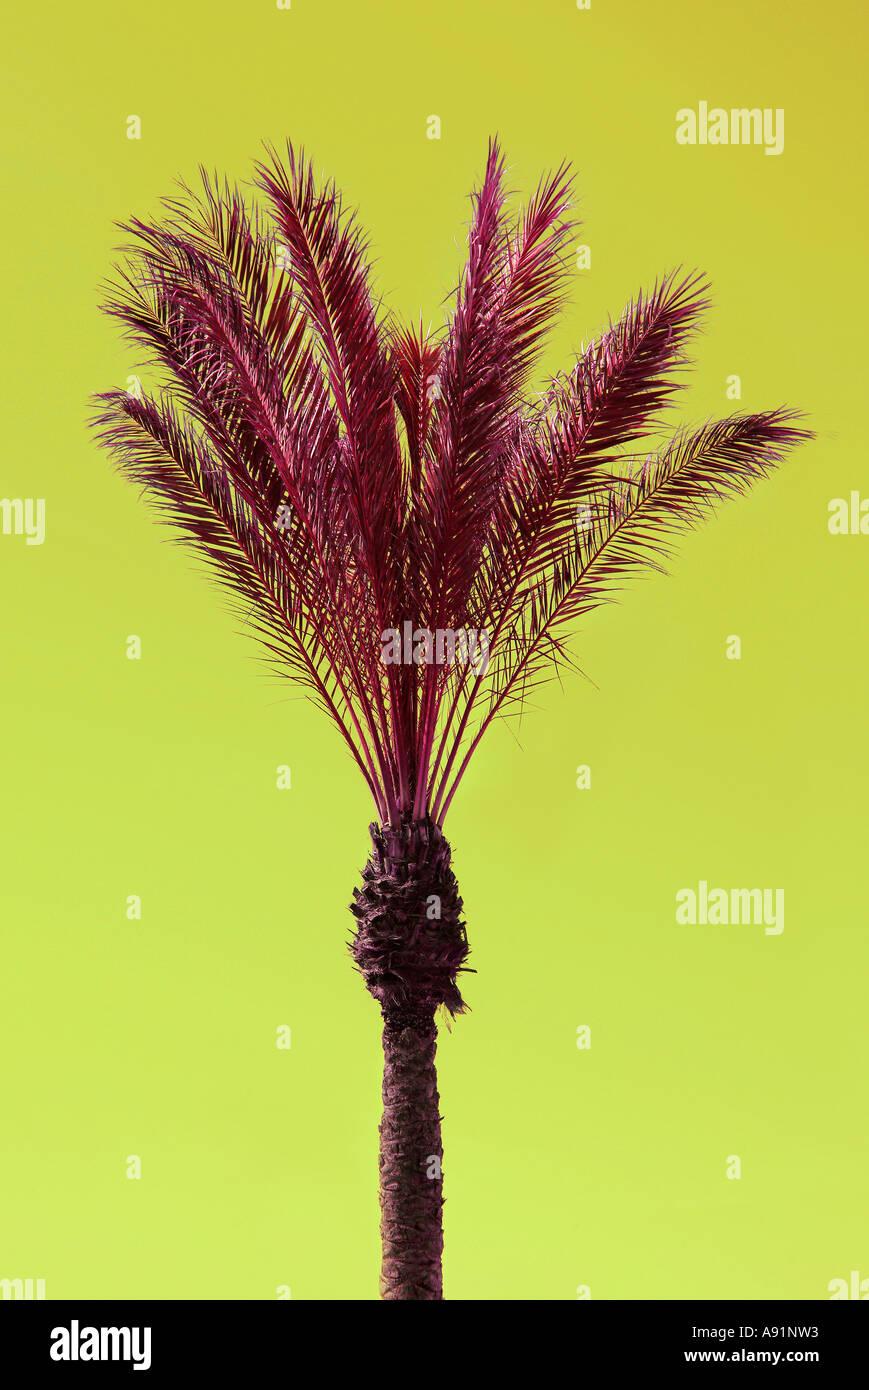 palms atlantic sea canary islands Palmen am Atlantik Meer Kanarische Inseln - Stock Image